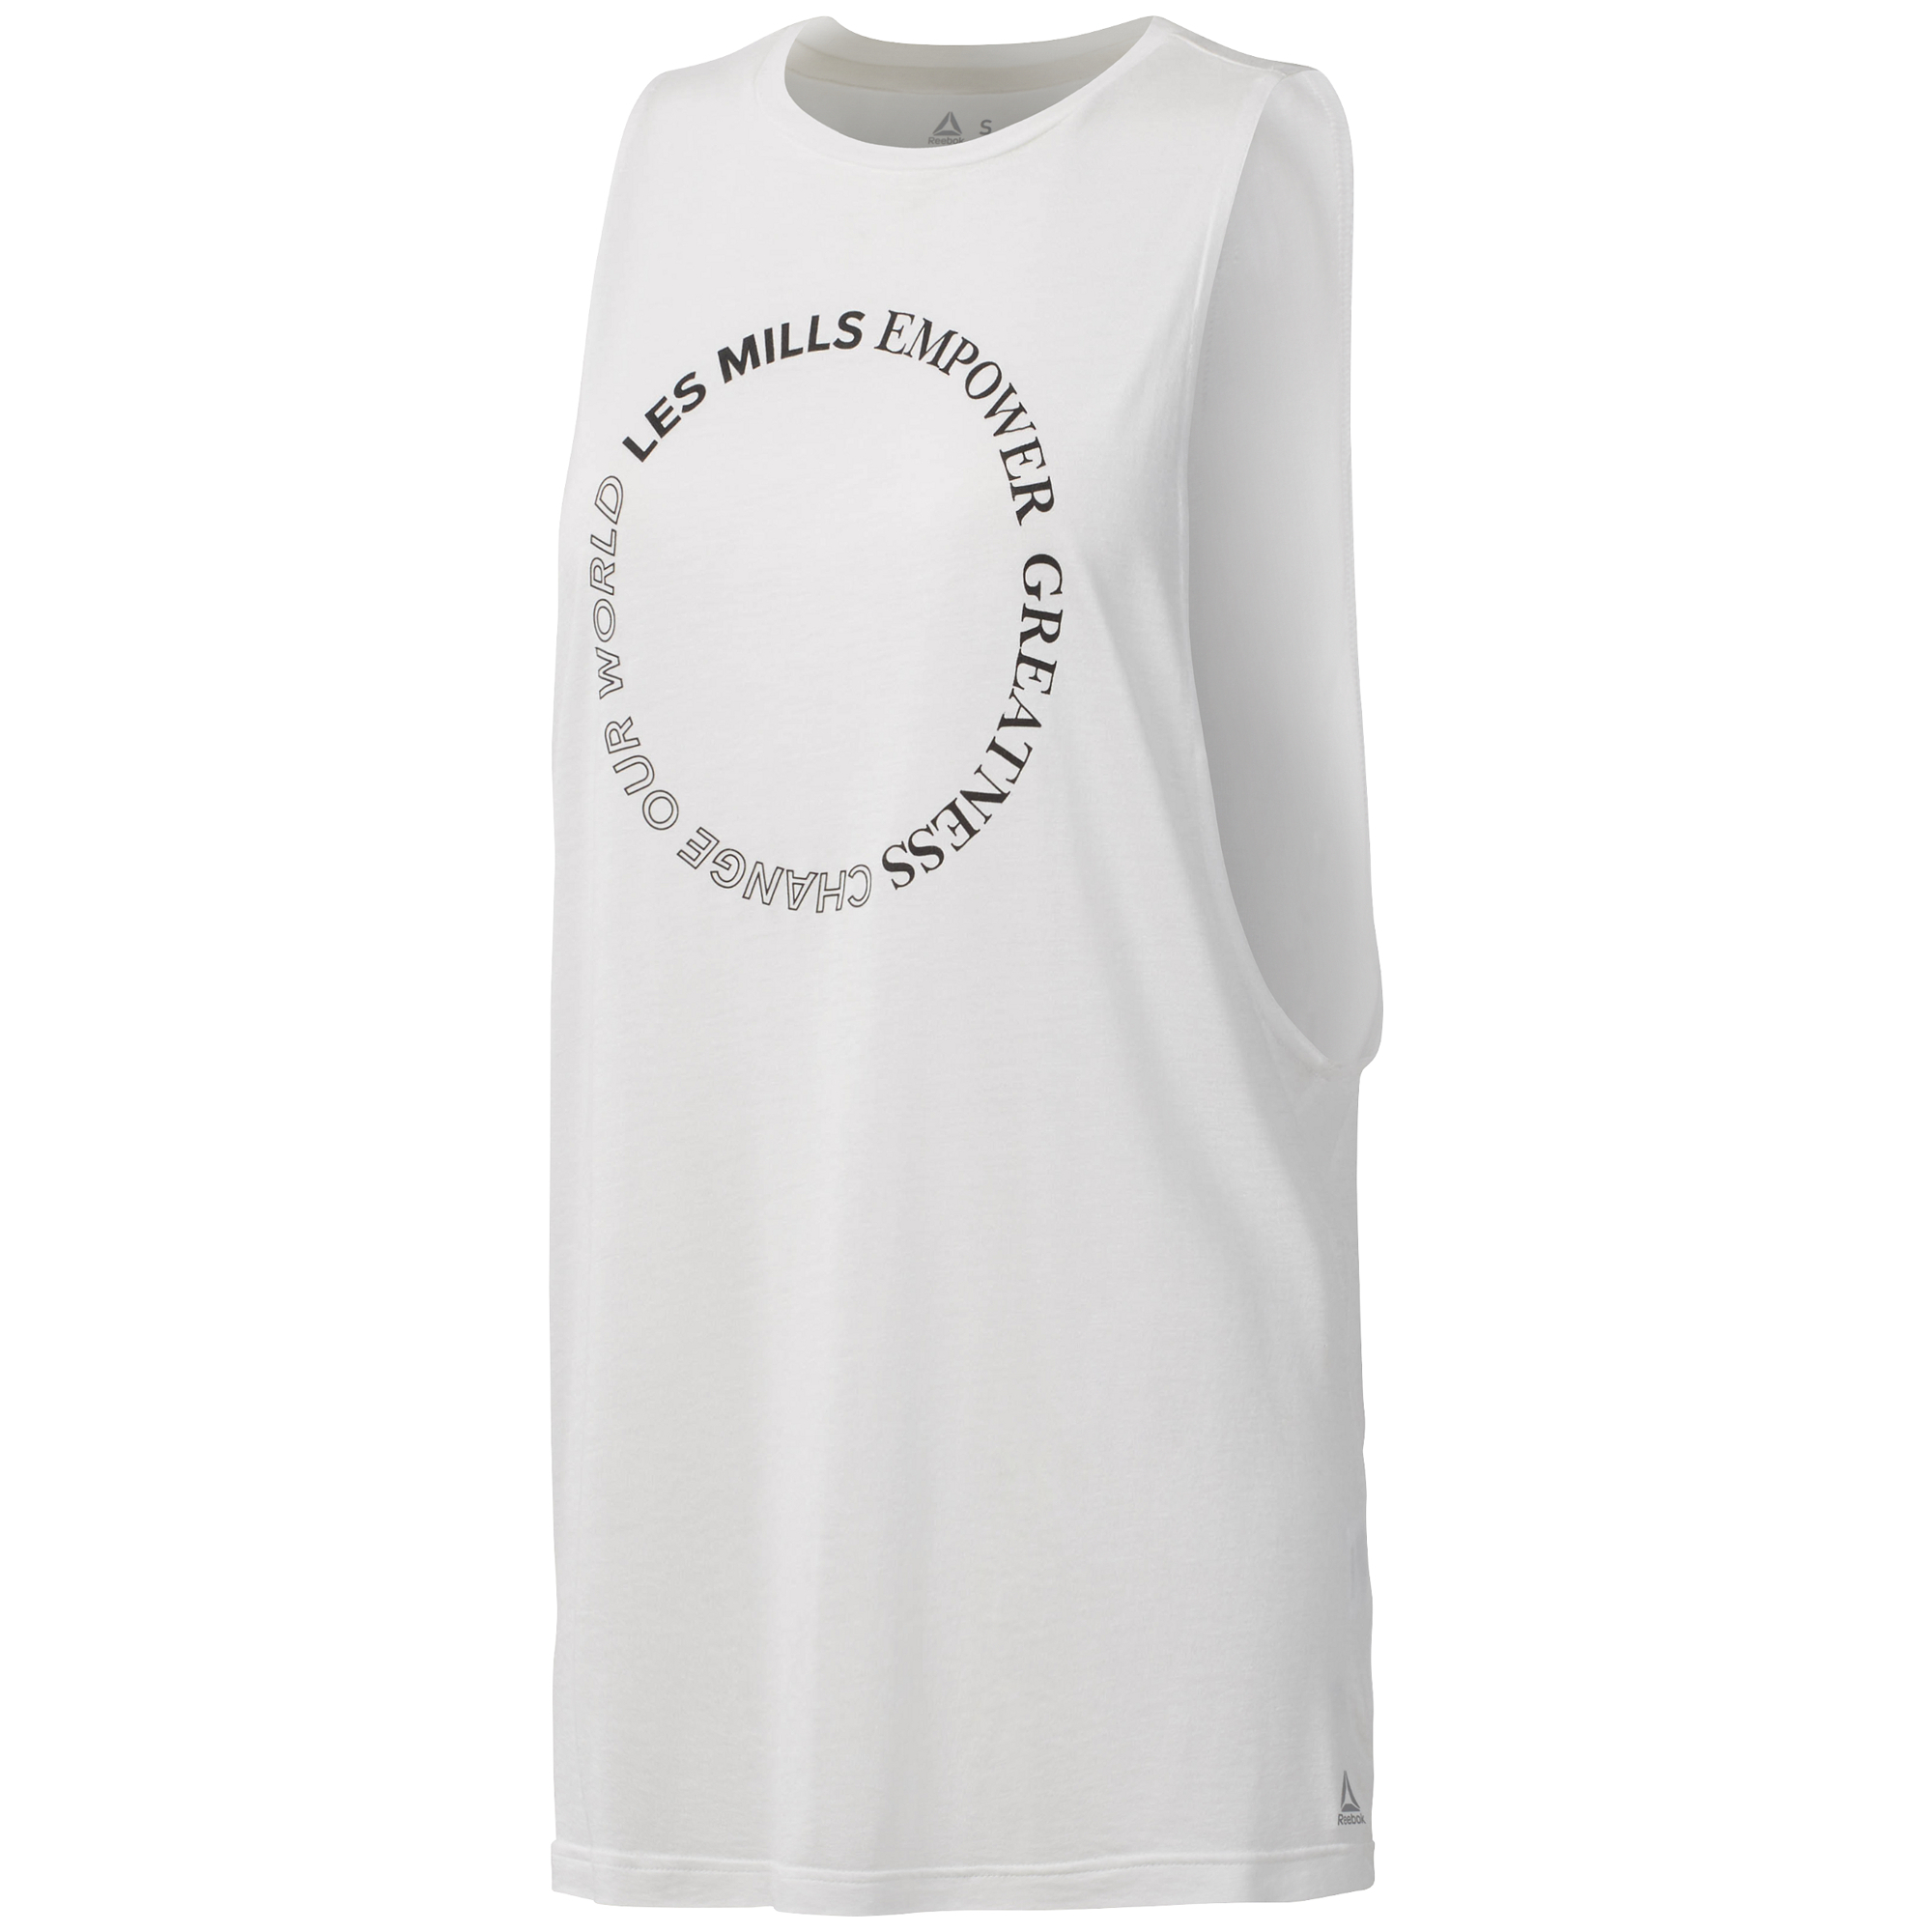 mujer para Camiseta Reebok tirantes mangas sin de cqLj3R54A